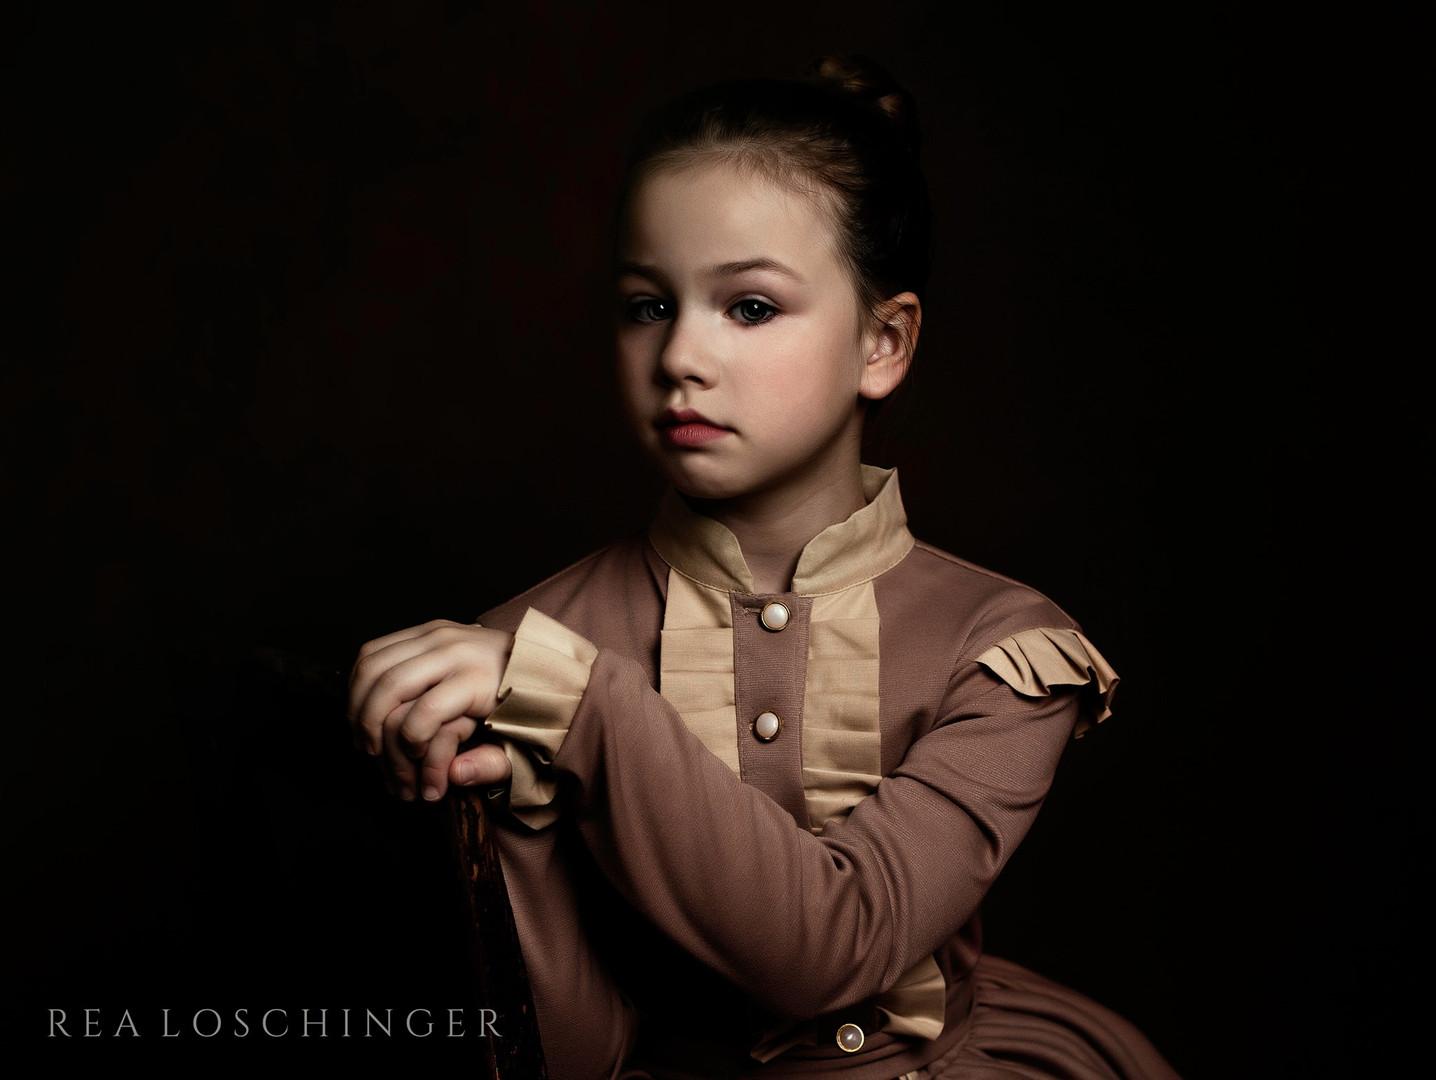 Rea Loschinger Kinderfotografie Berlin v